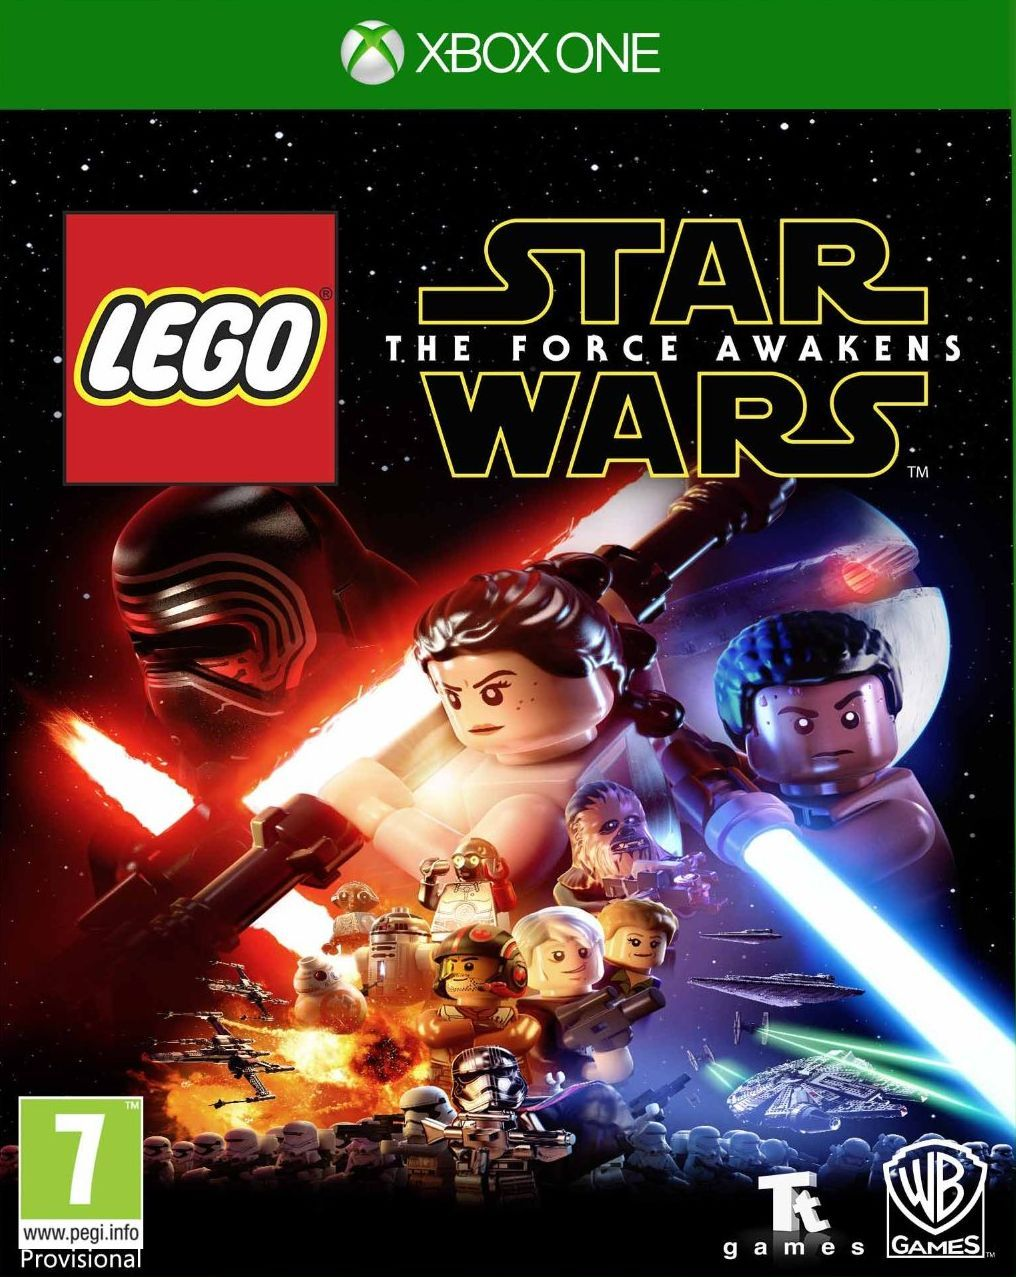 LEGO Star Wars The Force Awakens (Xbox One) - 1